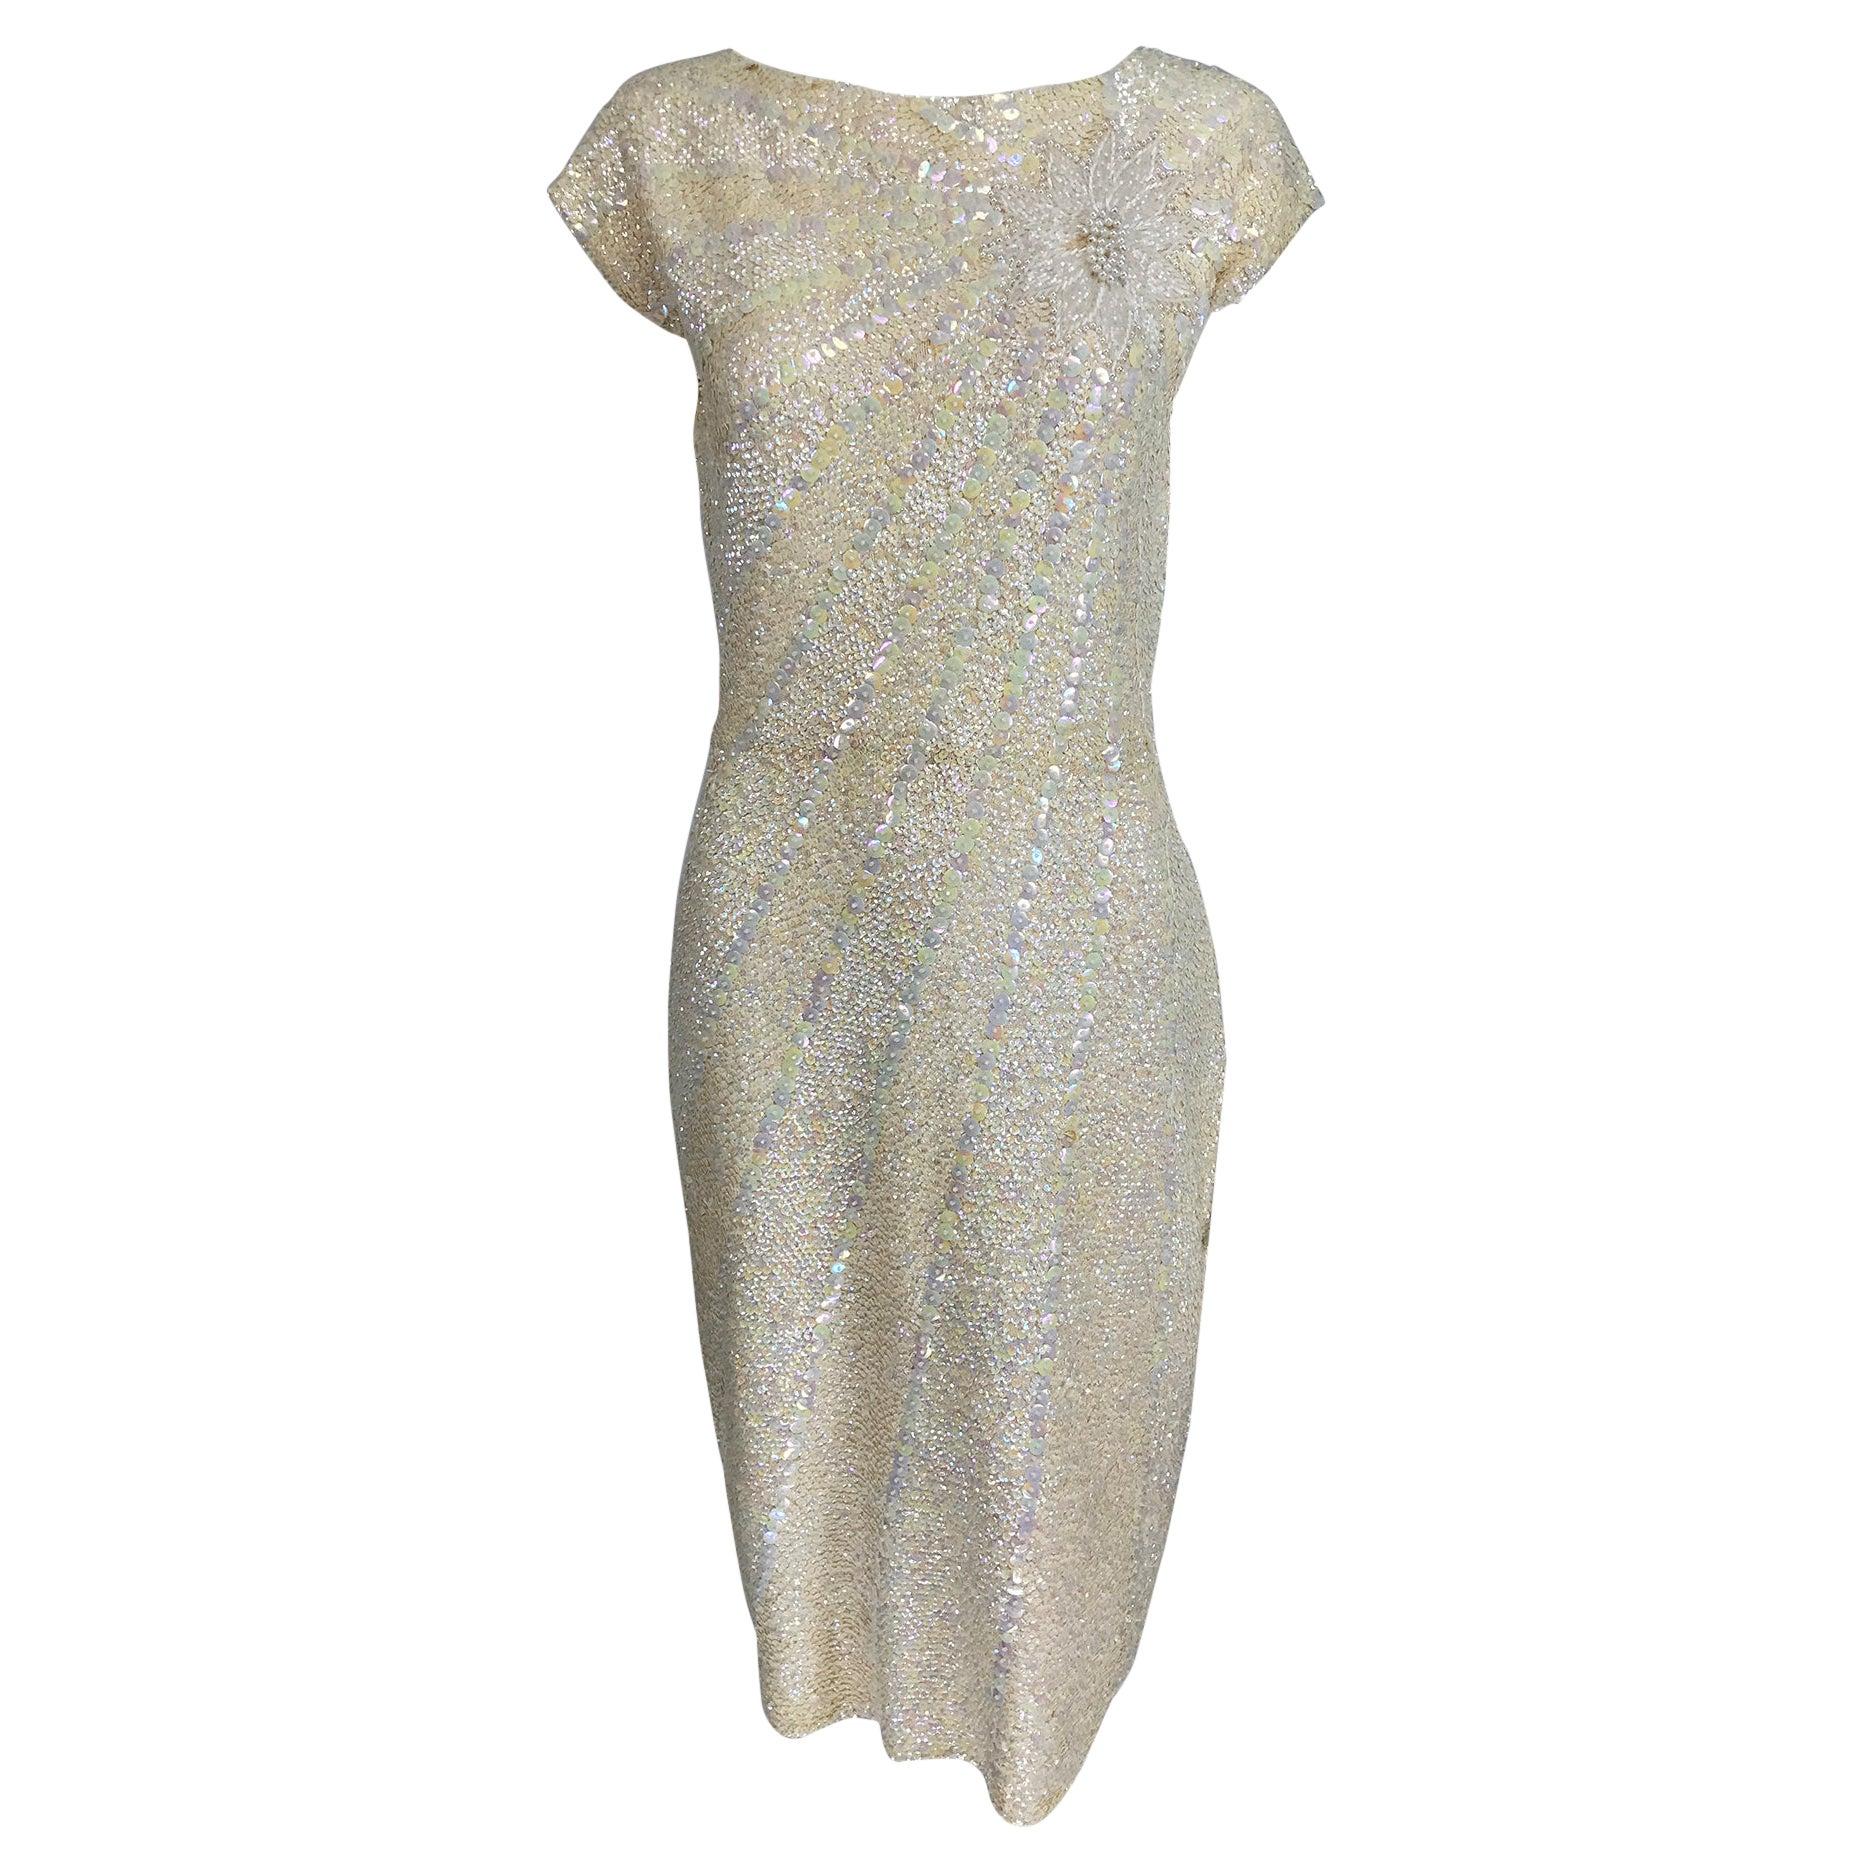 Gene Shelly's Boutique Internationale Cream Sequin Sheath Dress 1960s